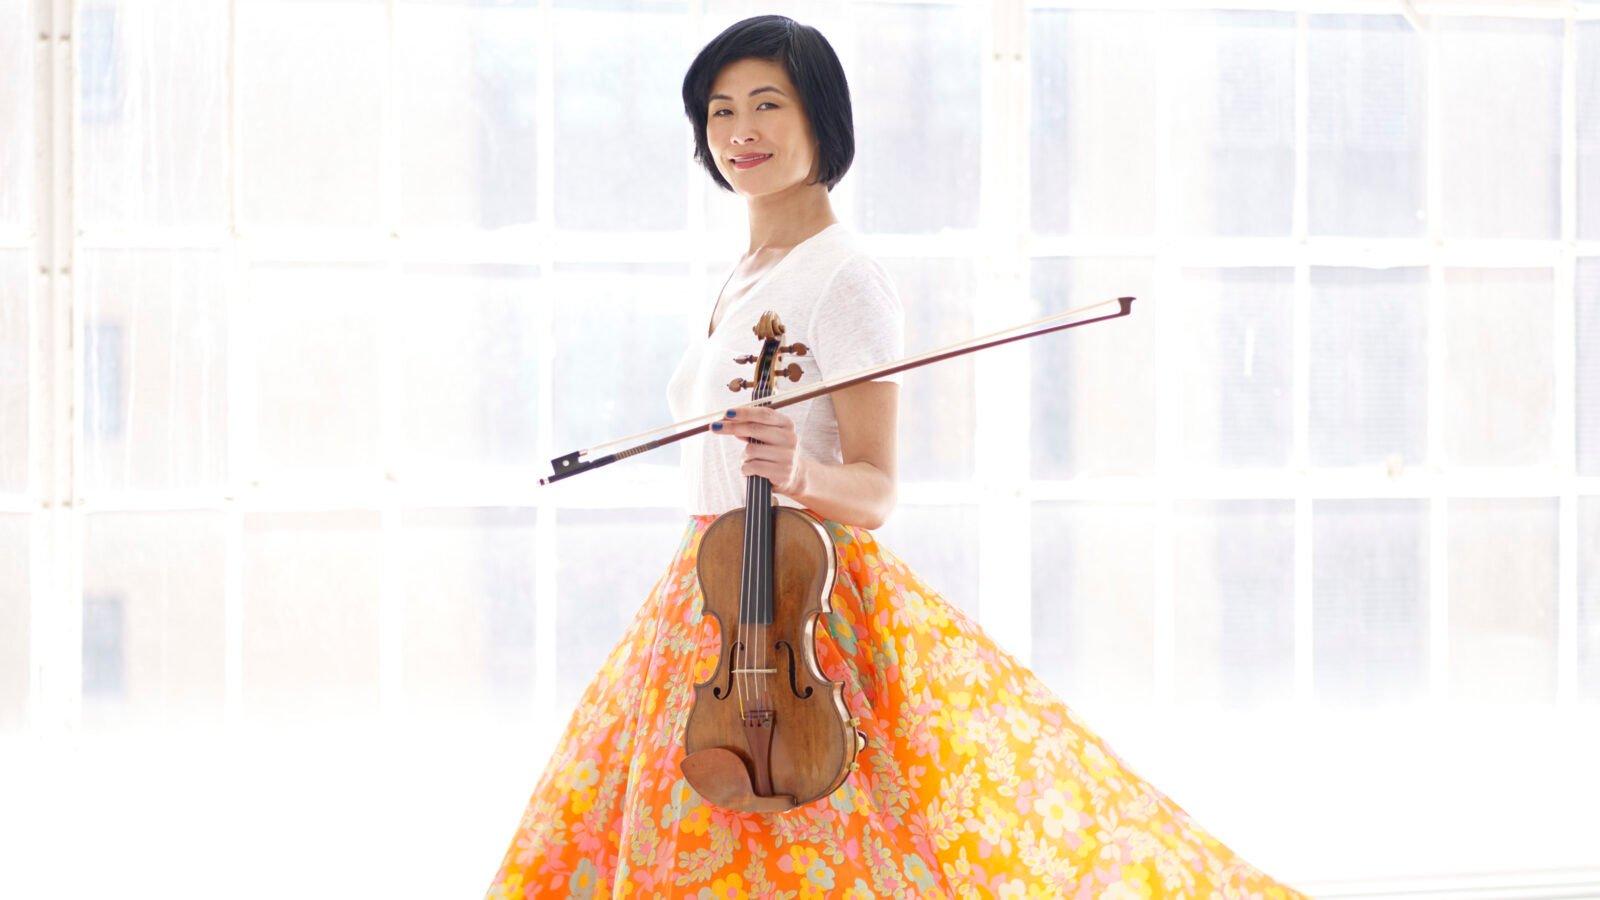 Violinist Jennifer Koh (Photo Juergen Frank)